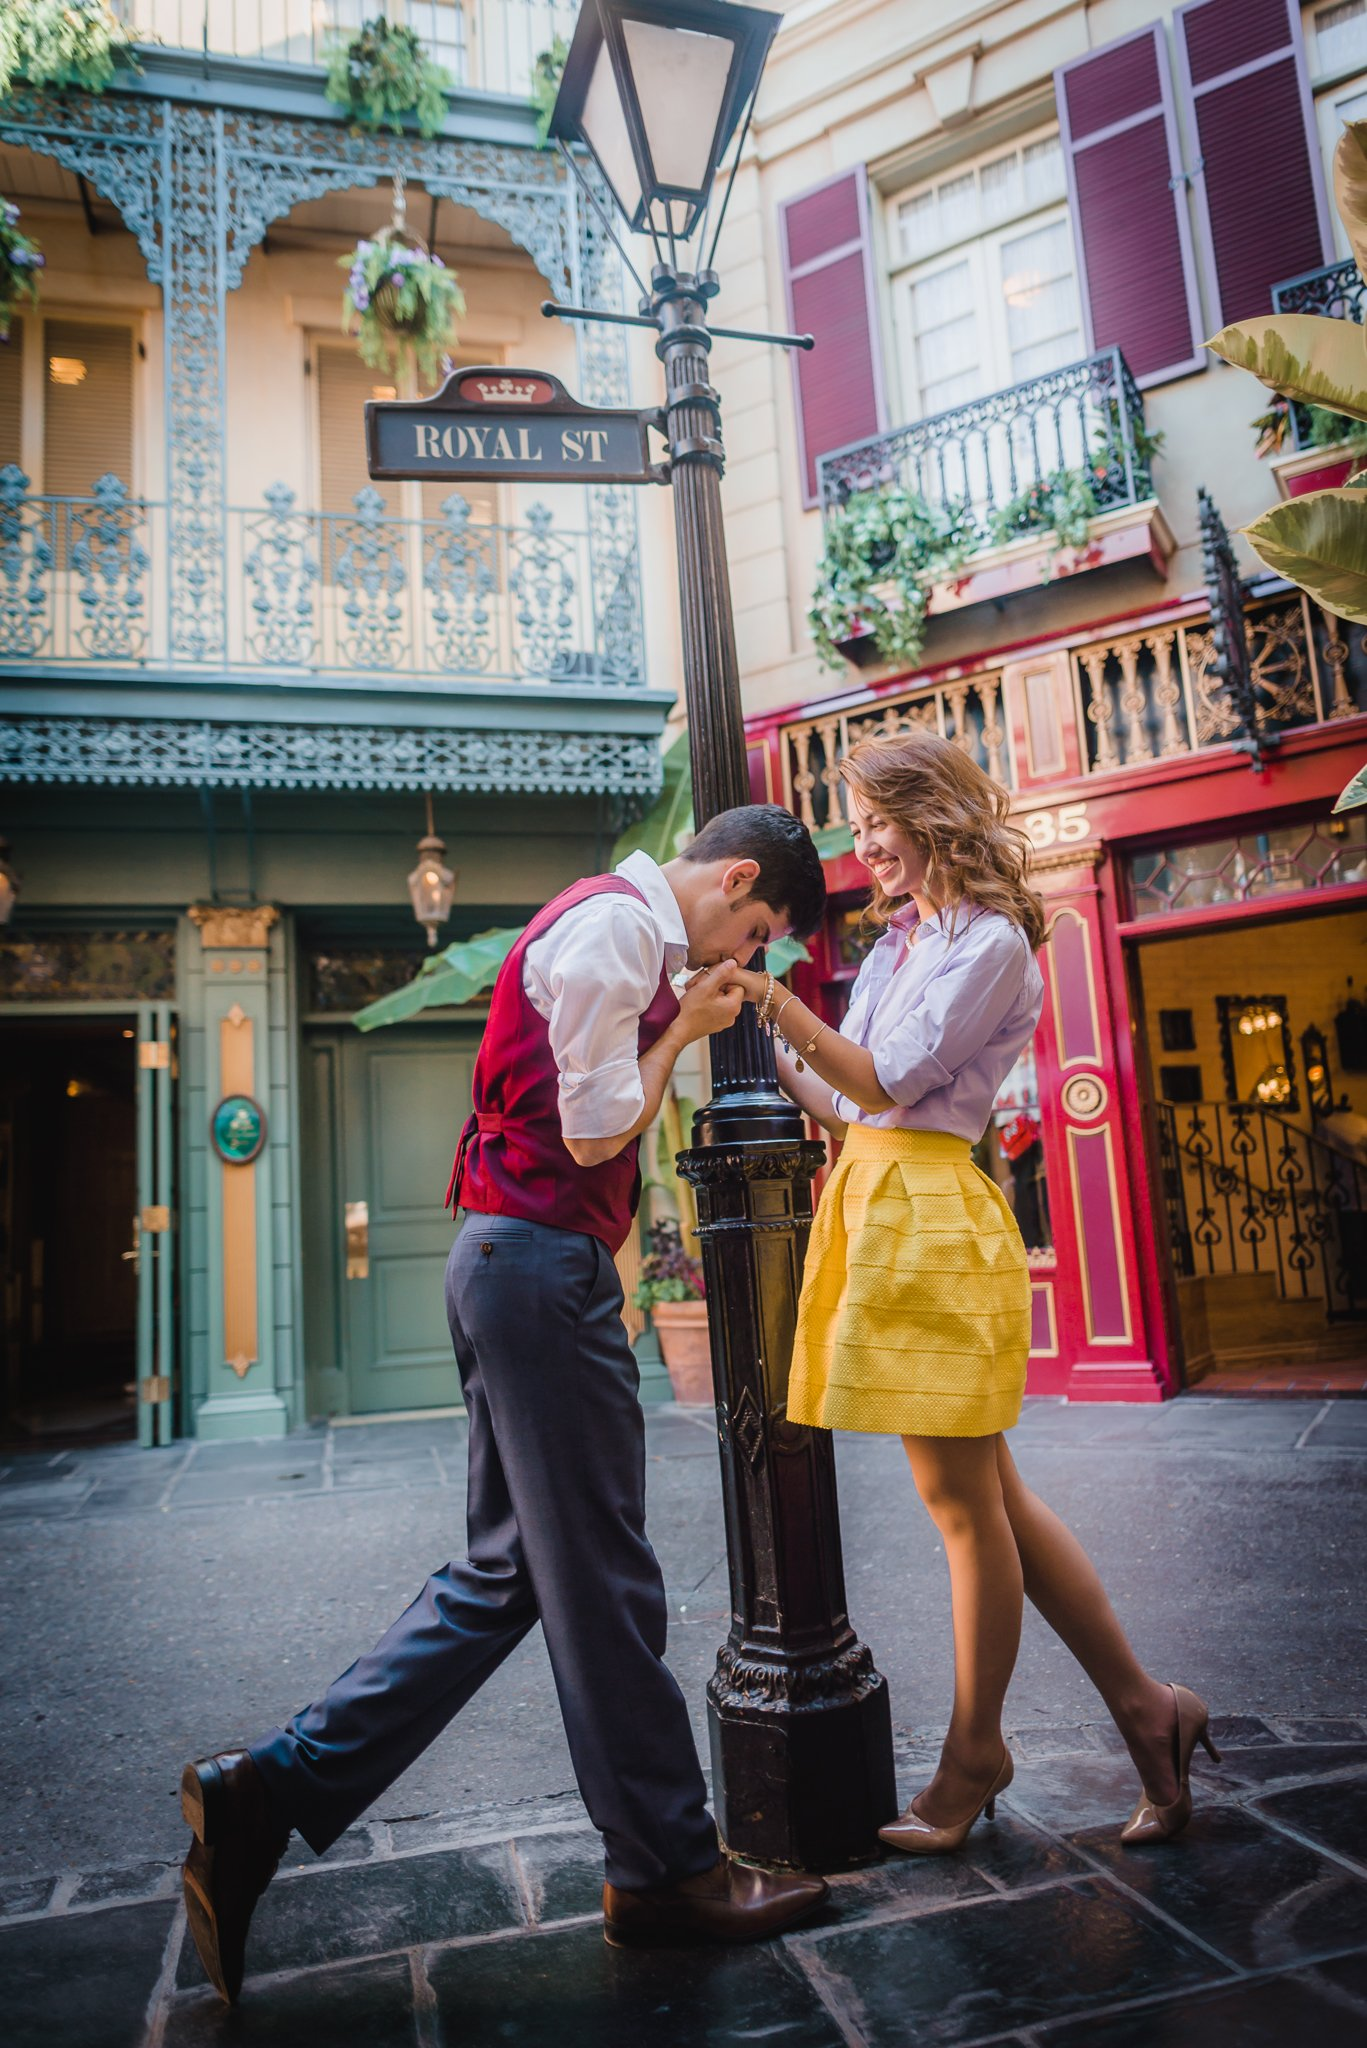 William and Marina walking through Disneyland